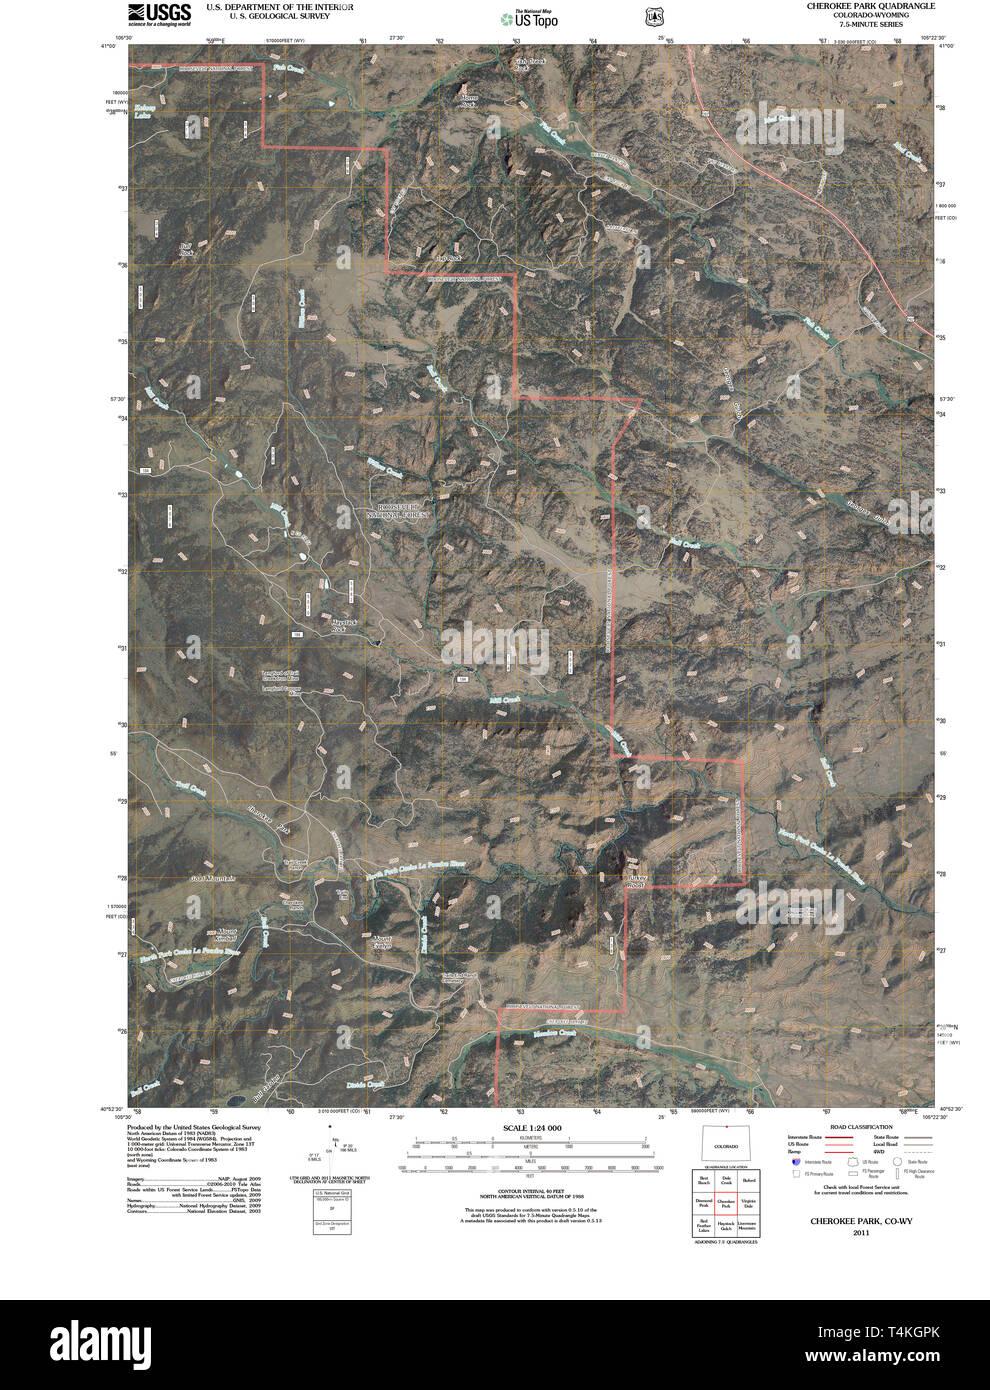 USGS TOPO Map Colorado CO Cherokee Park 20110209 TM ... Cherokee Park Map on seneca park map, rib mountain state park map, arlington park map, fontaine ferry park map, taylorsville lake state park map, cedars of lebanon state park map, long run park map, shelby park map, charlestown state park map, cherokee indian nation land map, tyler park map, tucson mountain park trail map, belle isle state park map, madison park map, cleveland park map, the cherokee map, mcclellan park map, sylvan park map, sunset park map, cherokee dam map,